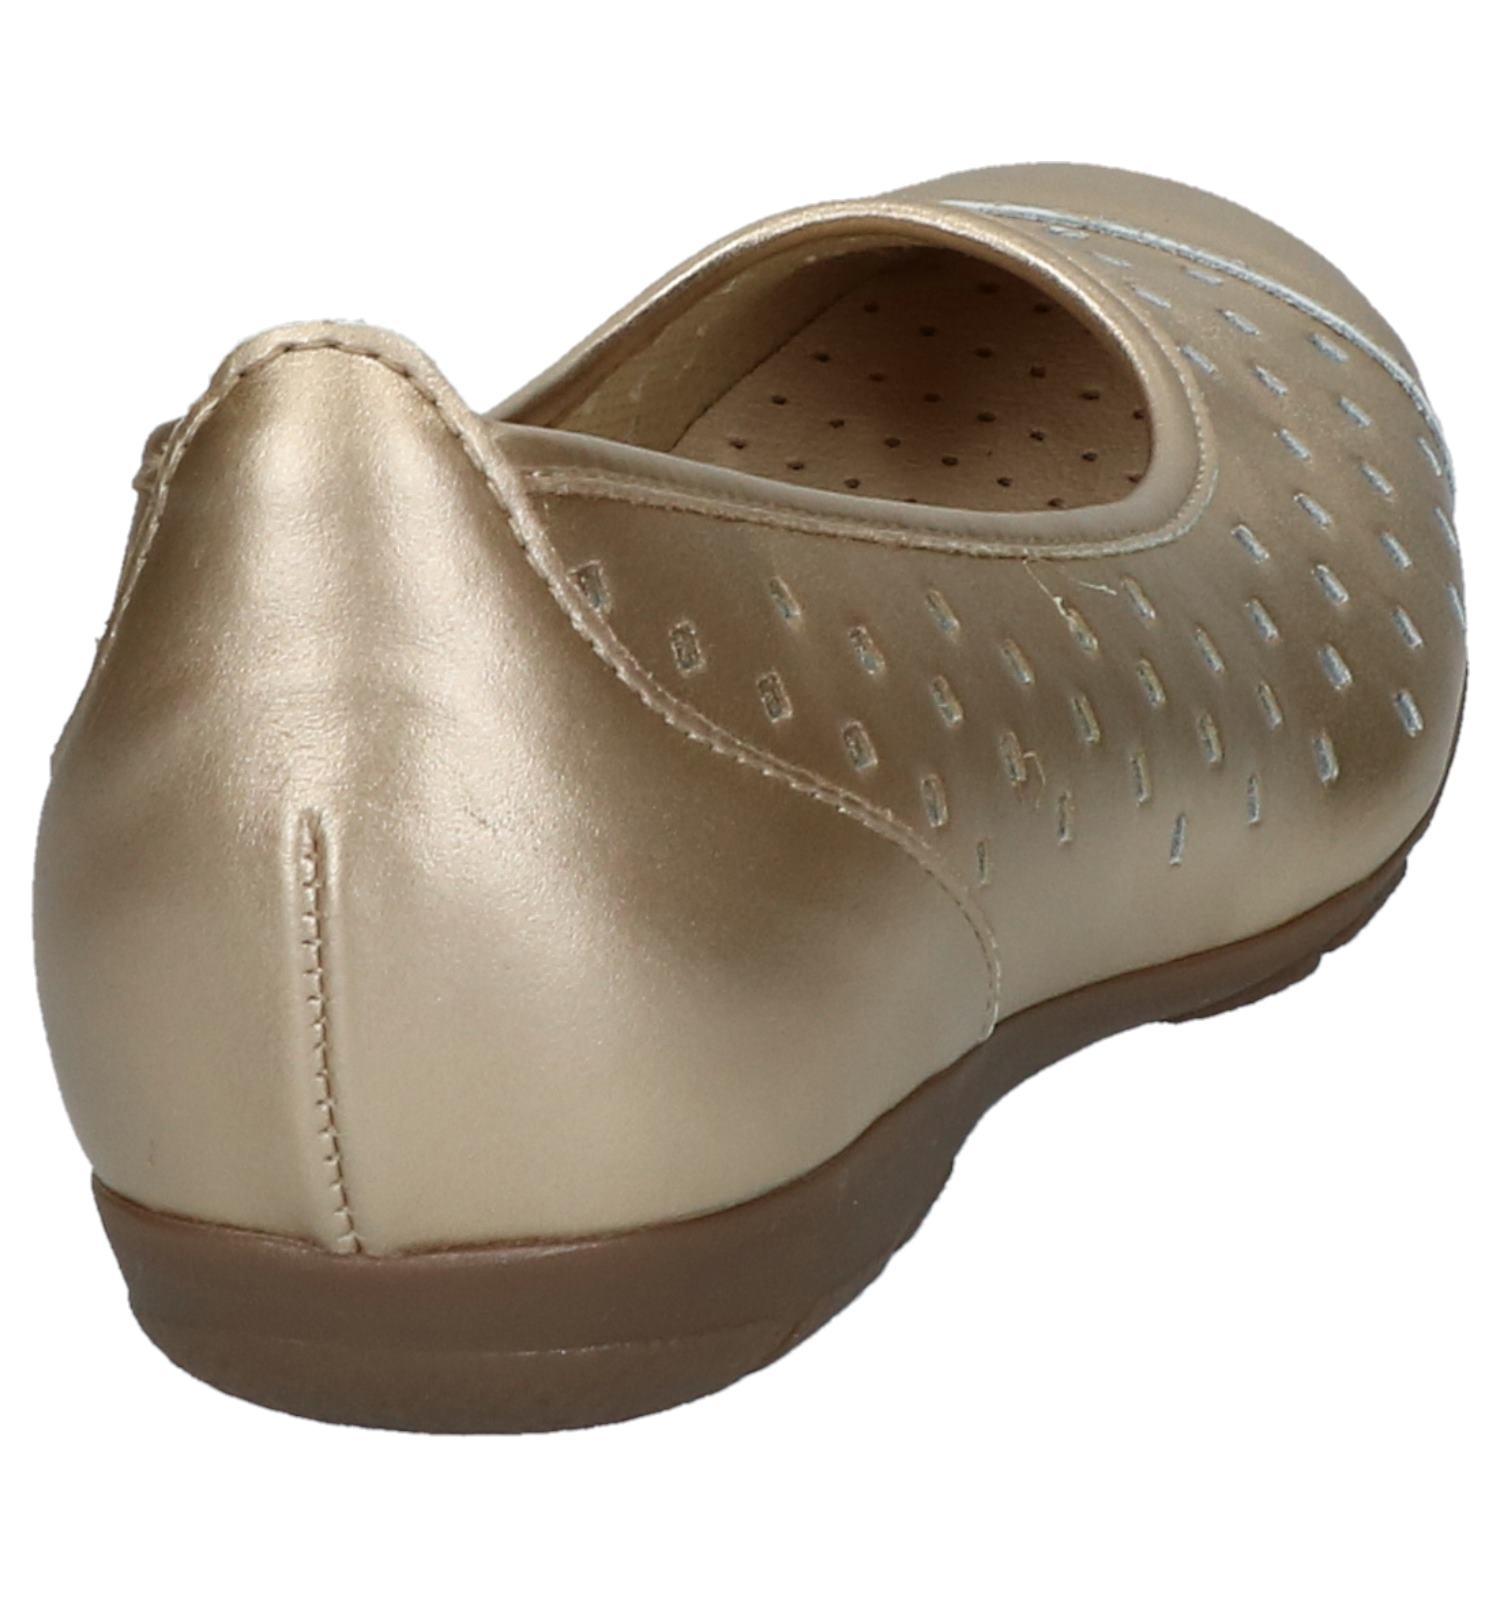 Klassieke Goud Ballerina's Ballerina's Goud Klassieke Hovercraft Gabor u3cTFl1KJ